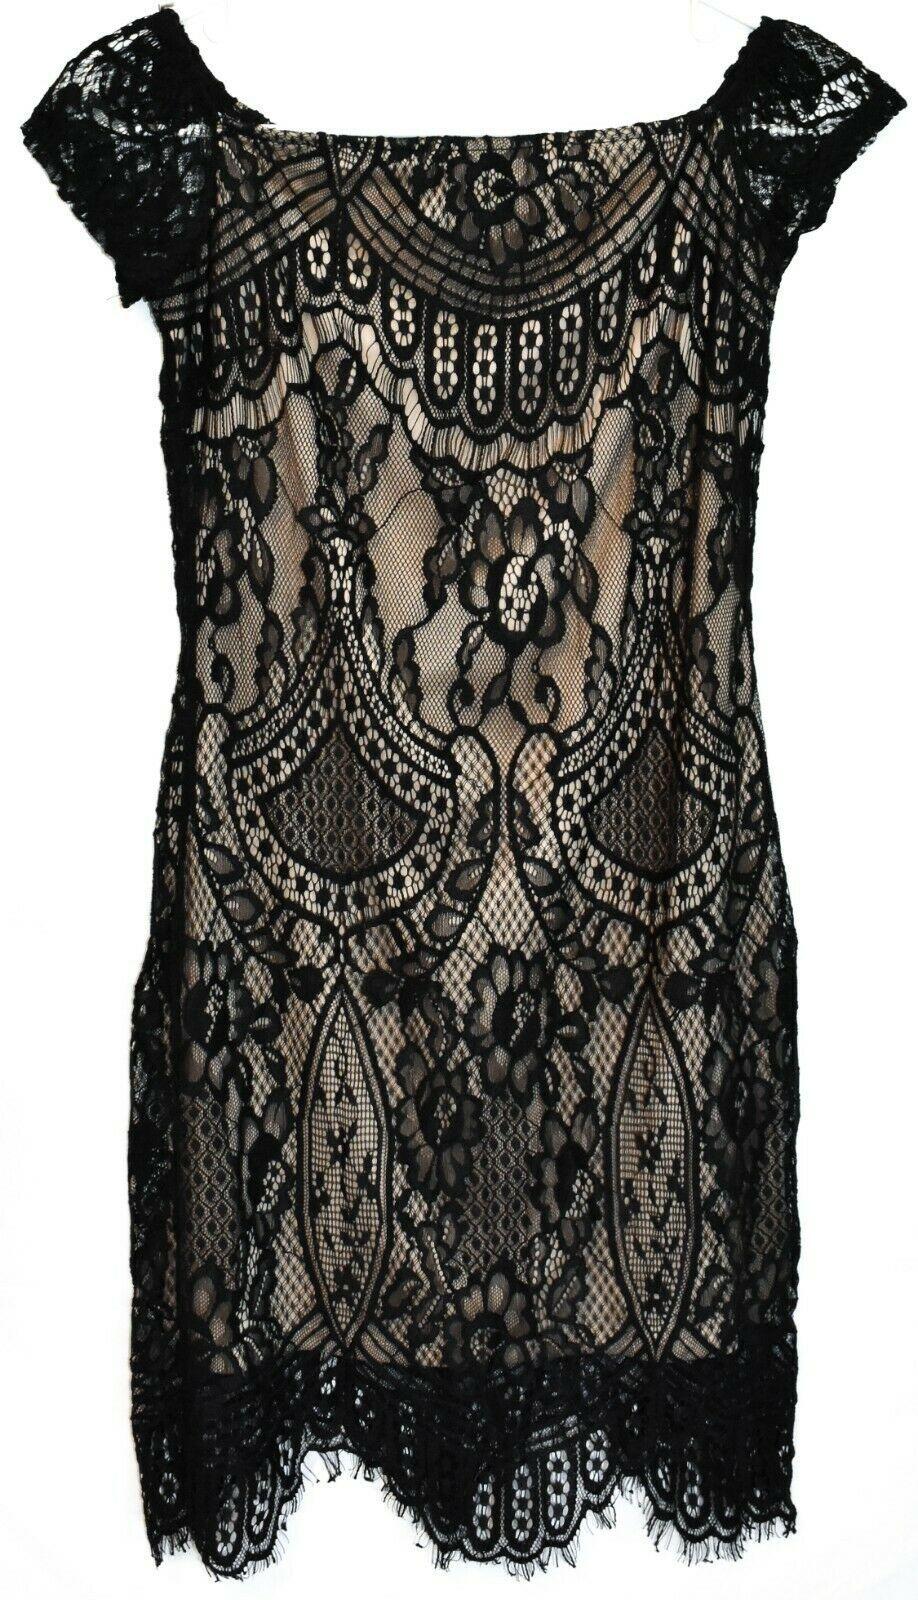 Love, Fire Women's Zip Up Black Lace Overlay Short Sleeve Dress Size S